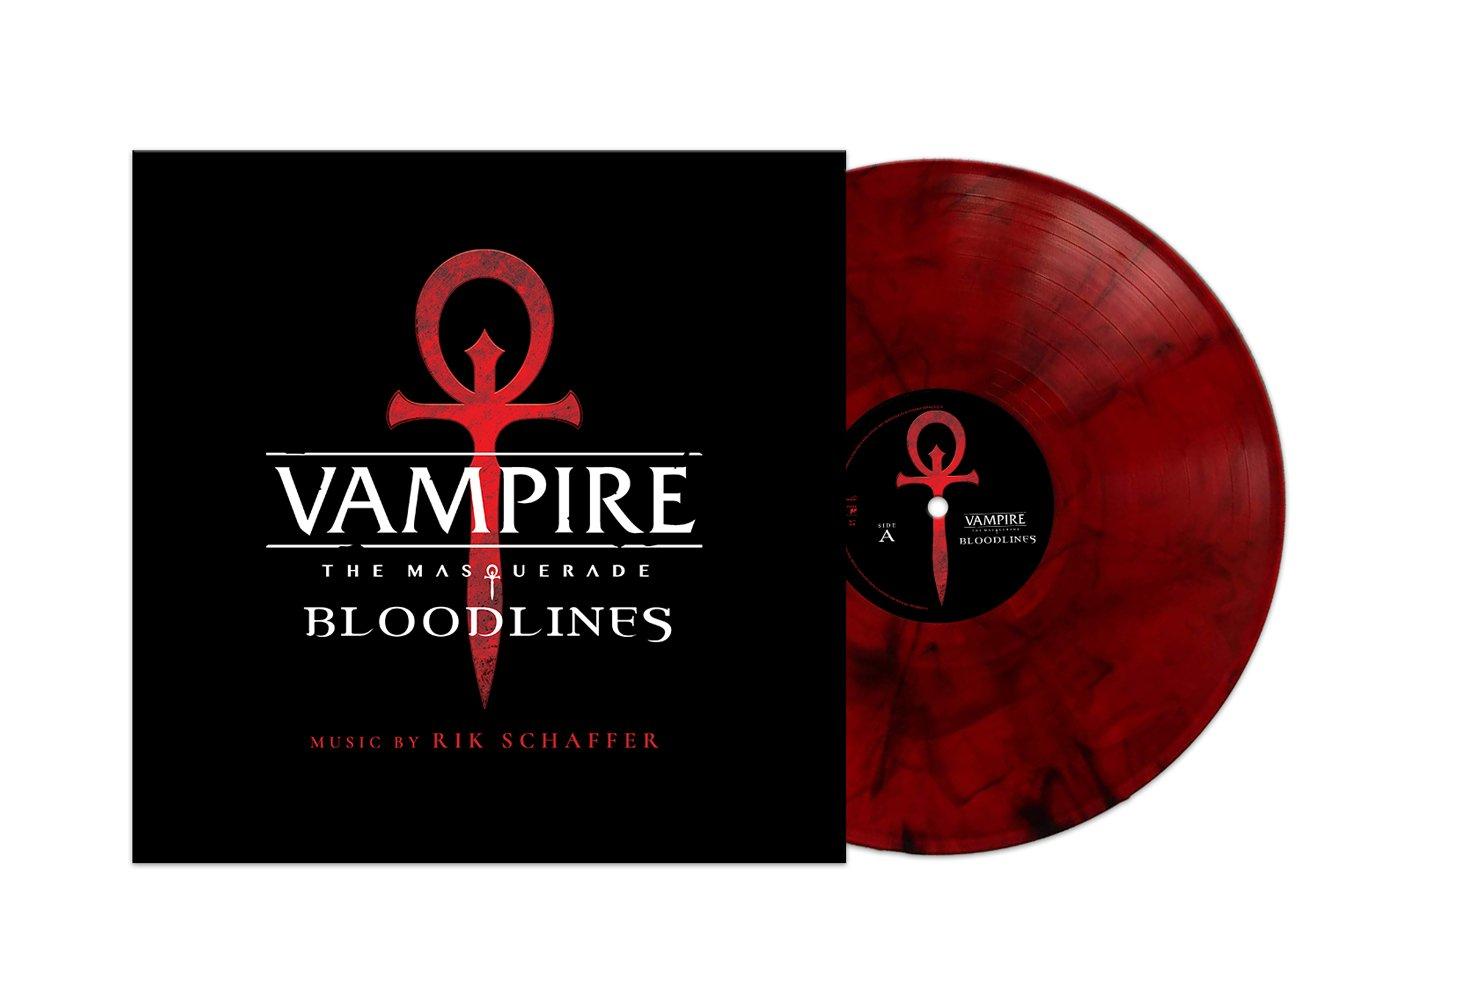 VampireTheMasquerade-Bloodlines_LP_Packshot_Cover-Vinyl